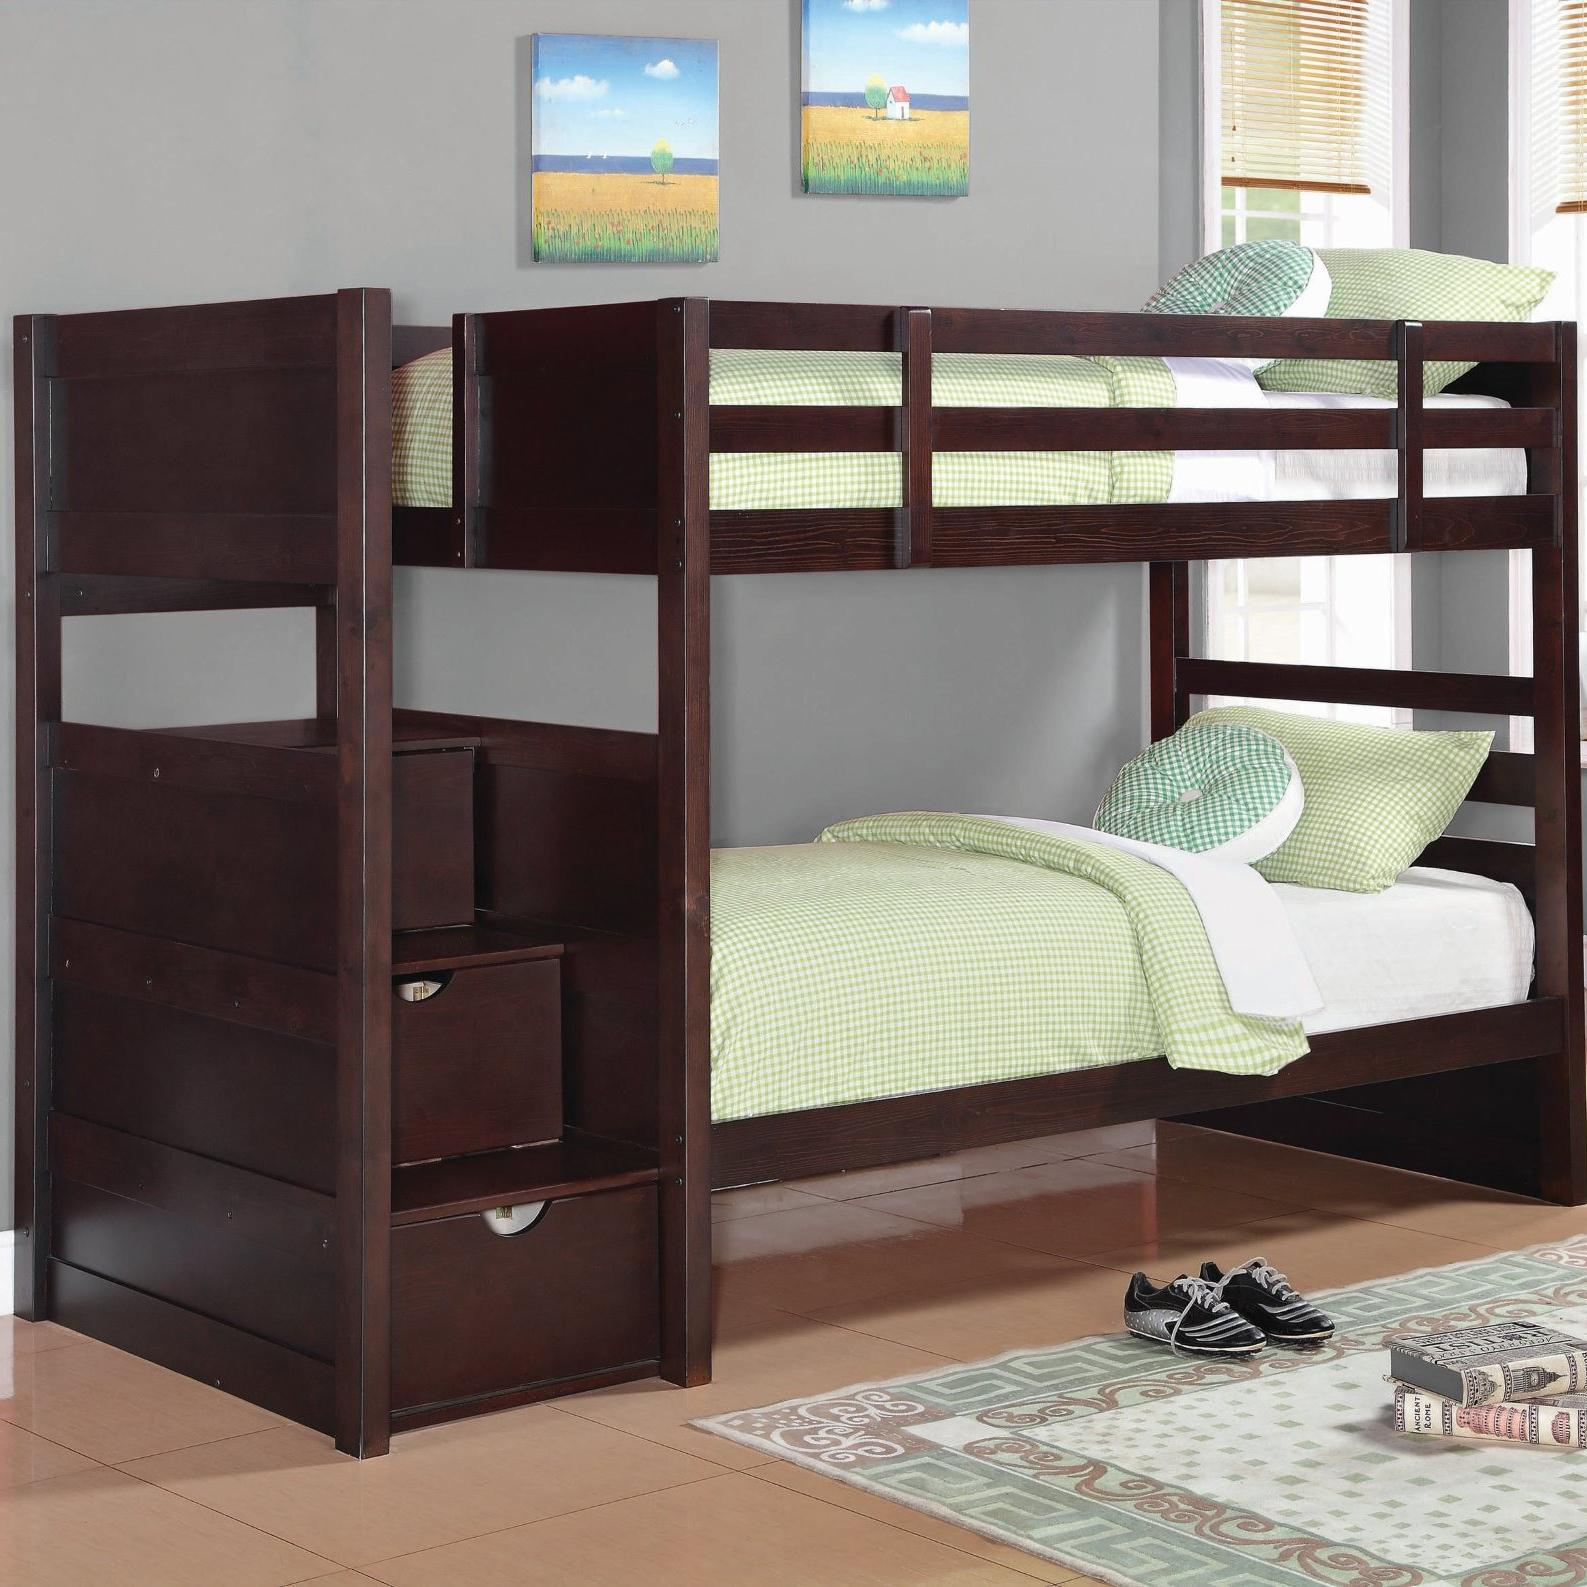 Coaster Elliott Bunk Bed - Item Number: 460441